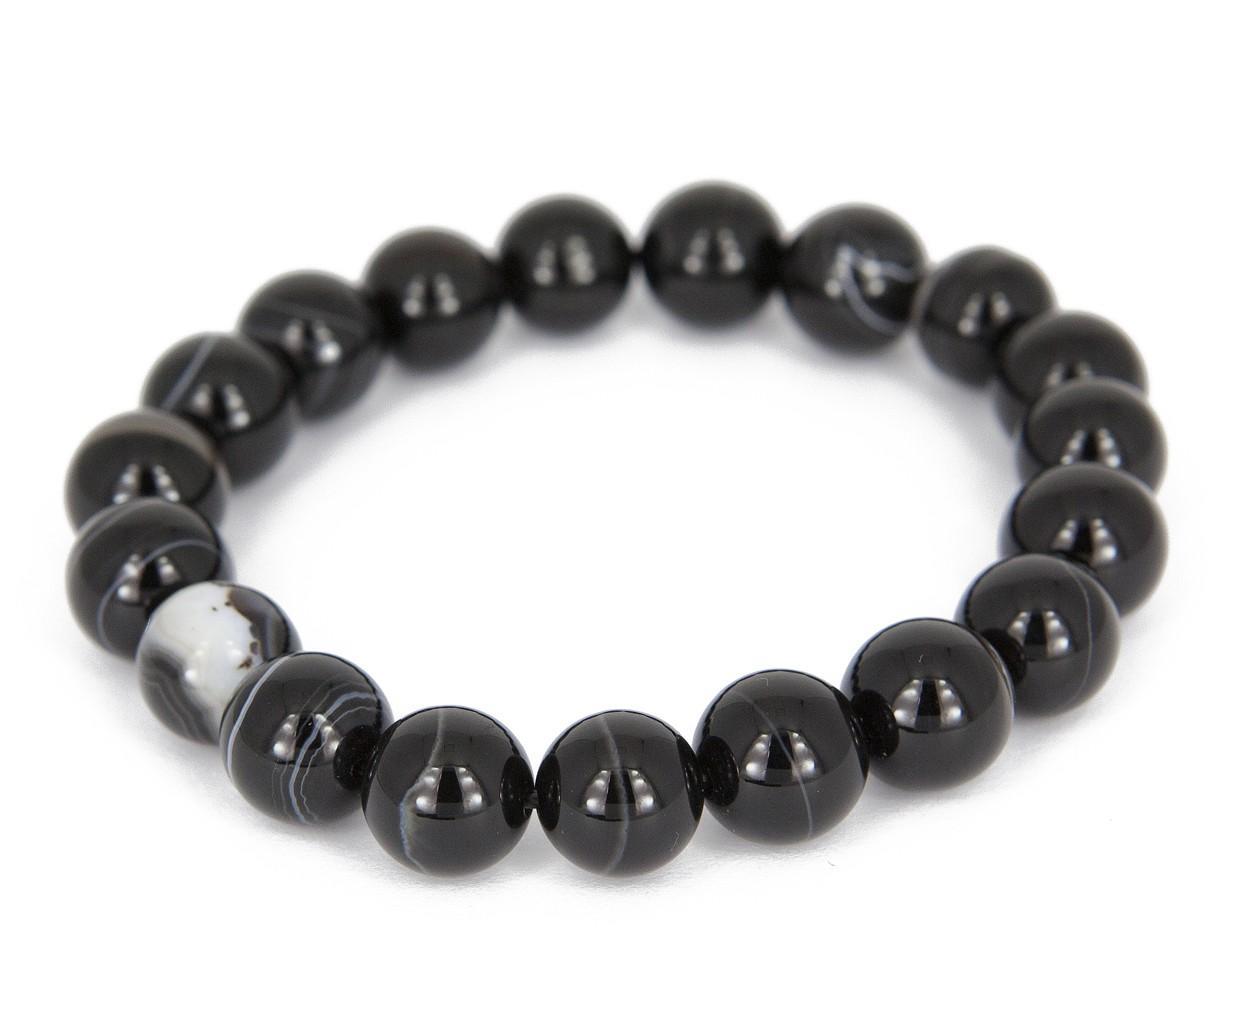 bracelet-shamballa-perle-dagate-noire-rock-at-l-ytsdqh